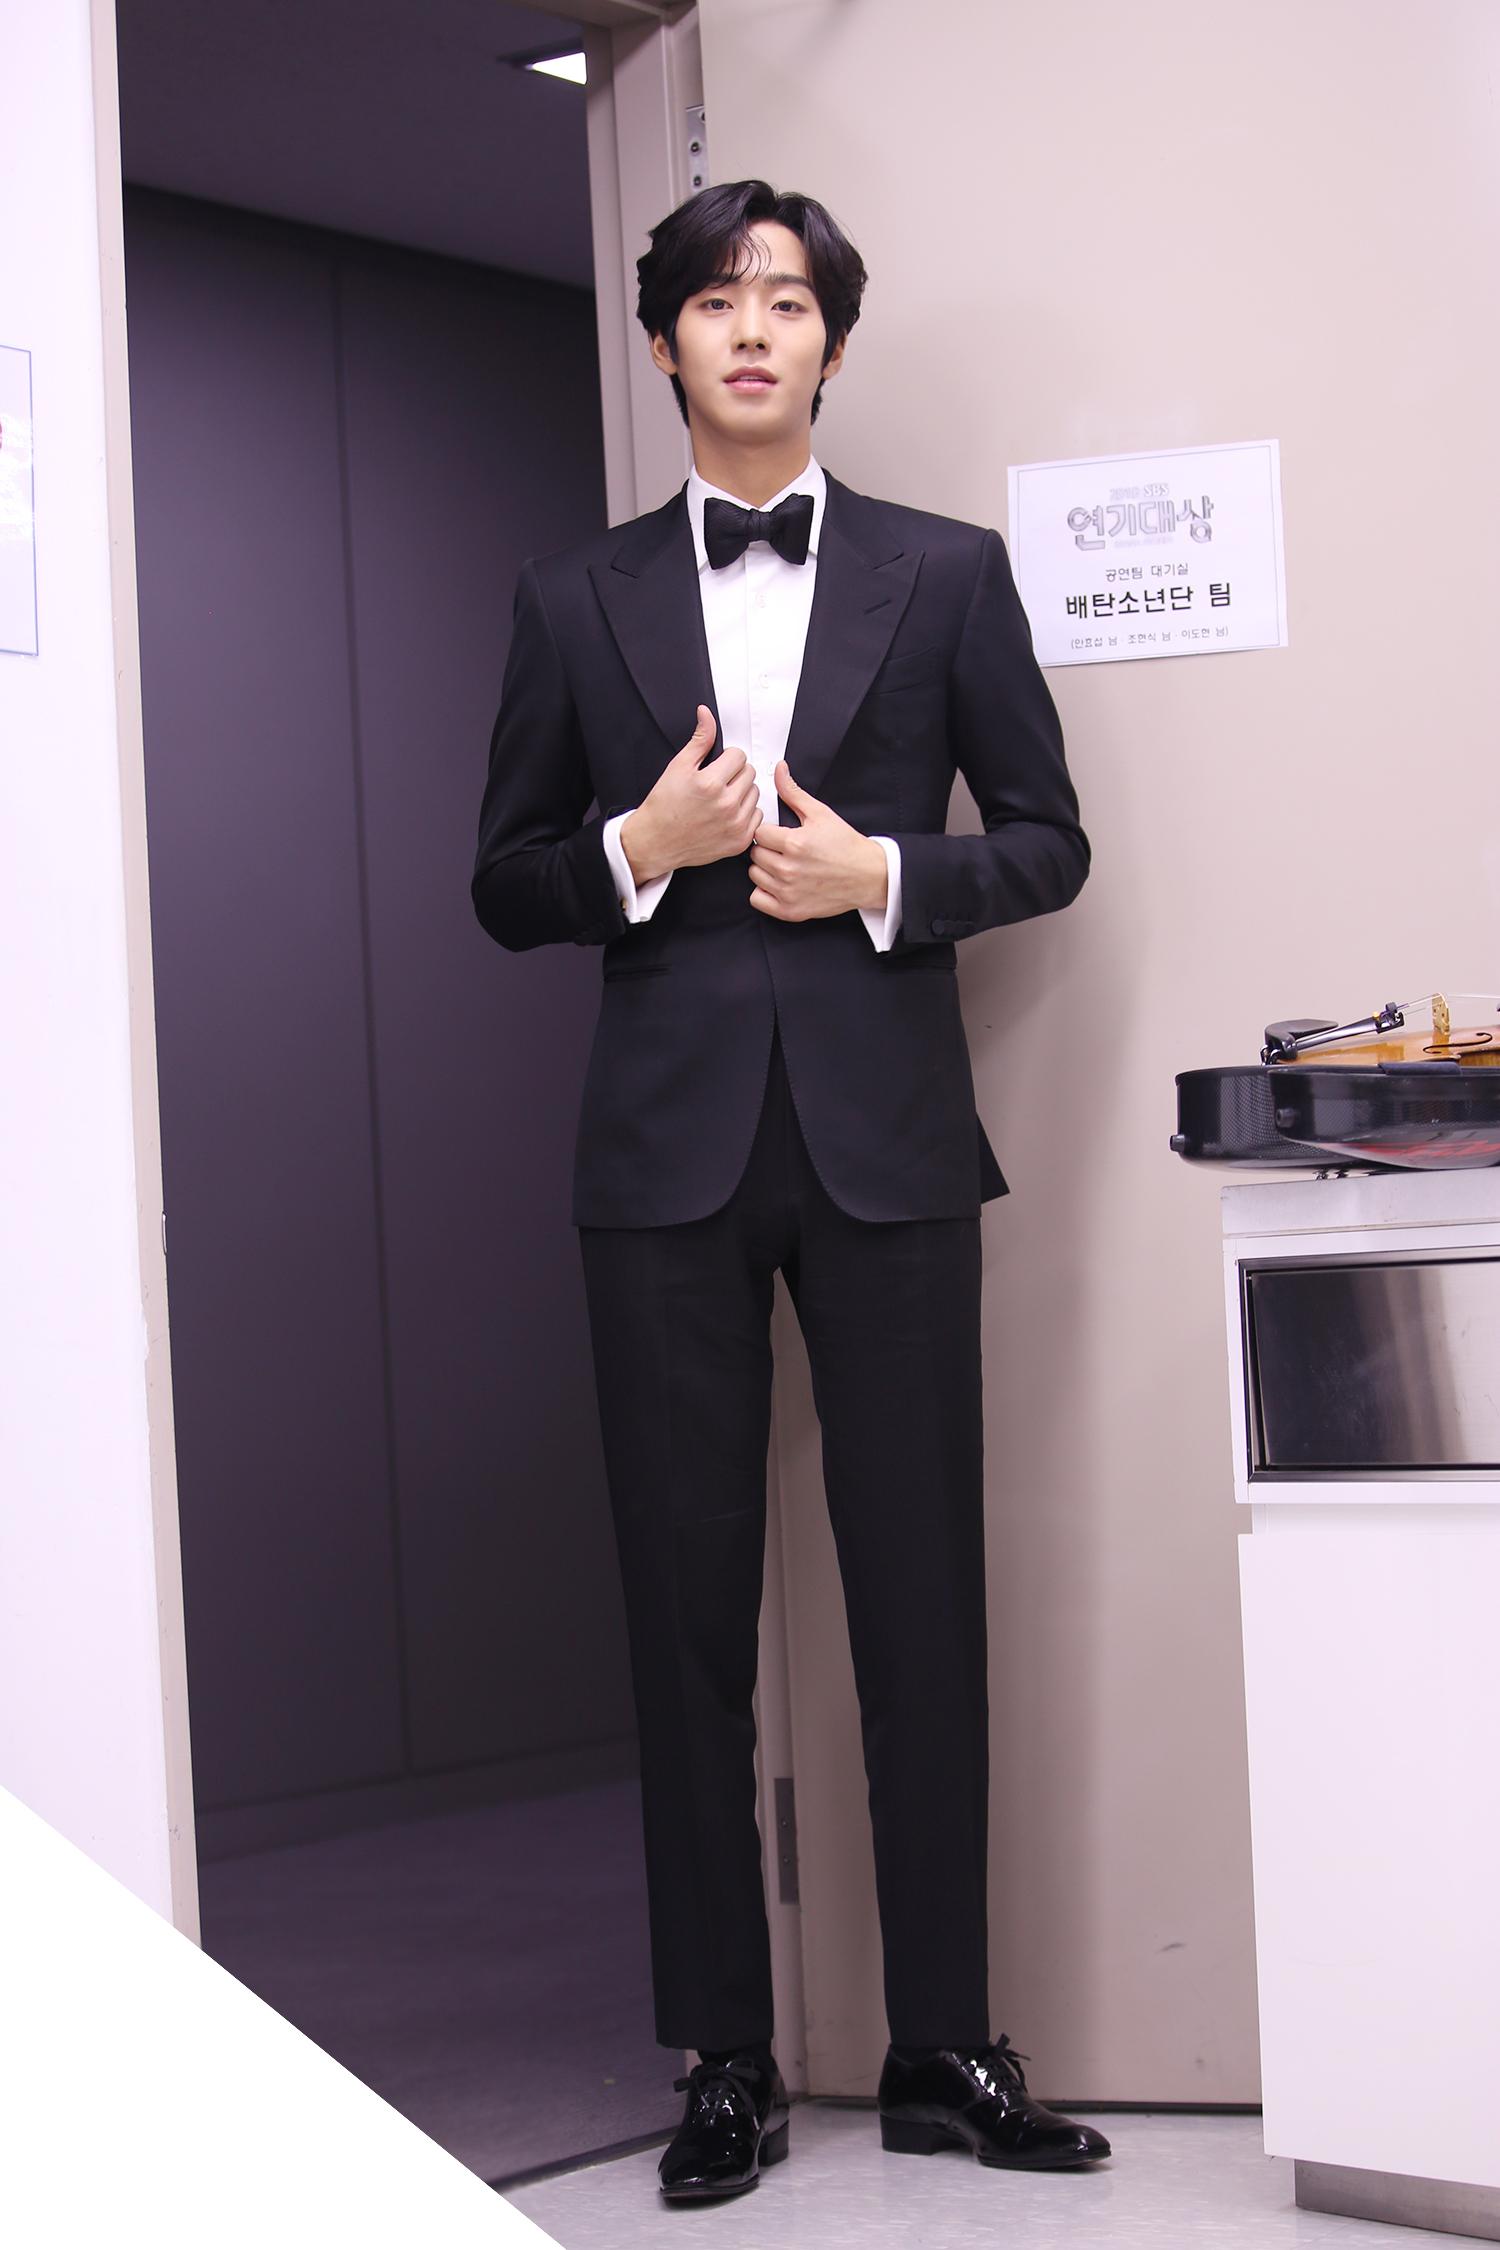 tall korean celebrities, idols 187 cm, actors 187 cm, ahn hyoseop